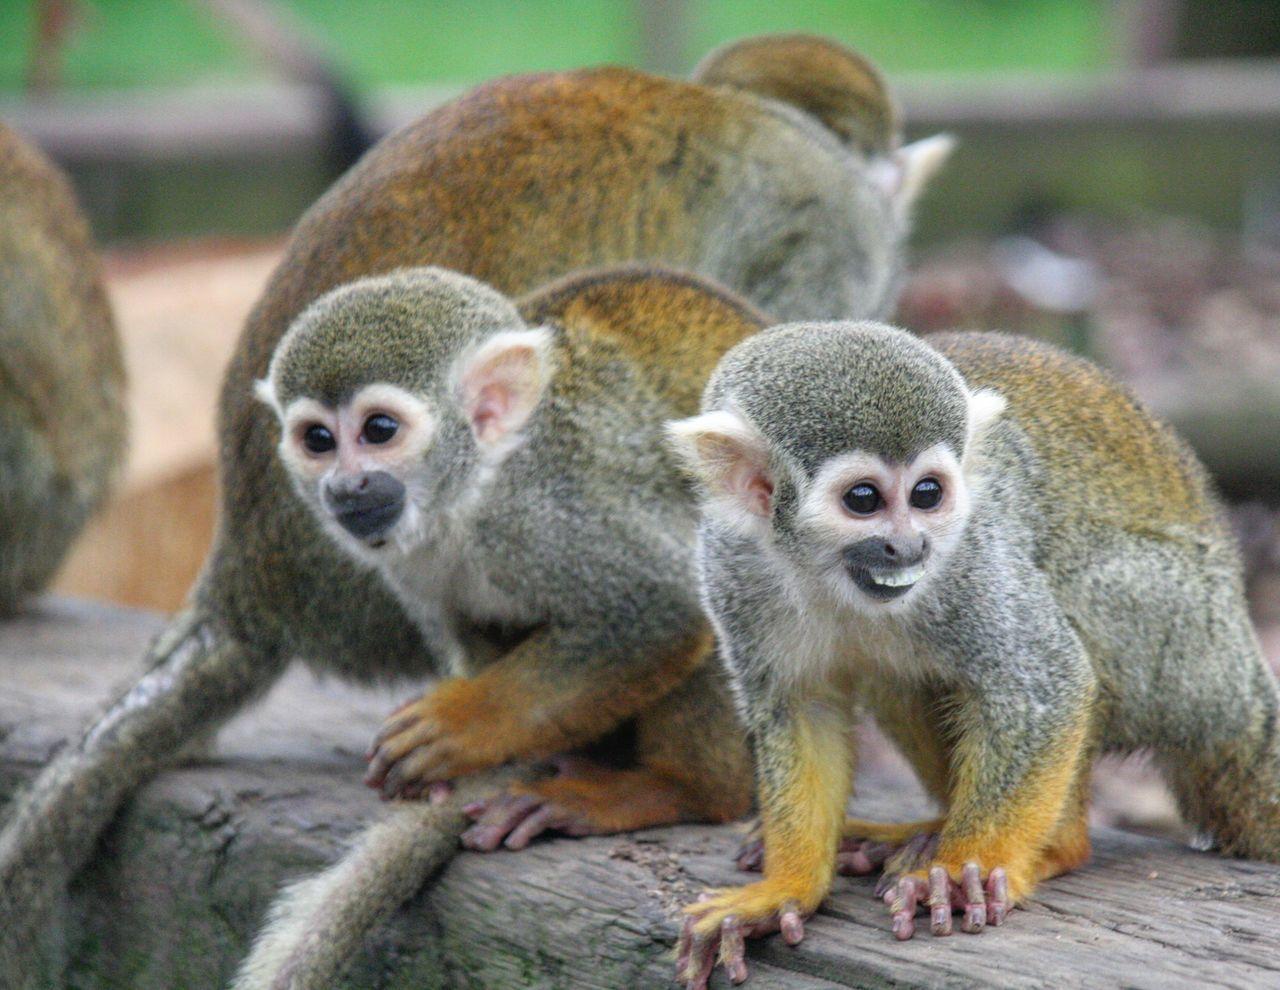 squirrel monkey Animal Wildlife Animal Themes Monkey Animals In The Wild Togetherness Nature Squirrel Monkey Eyeem Market Trending Photos Popular EyeEmGalley EyeEm Gallery EyeEmBestPics EyeEmNewHere EyeEm Team